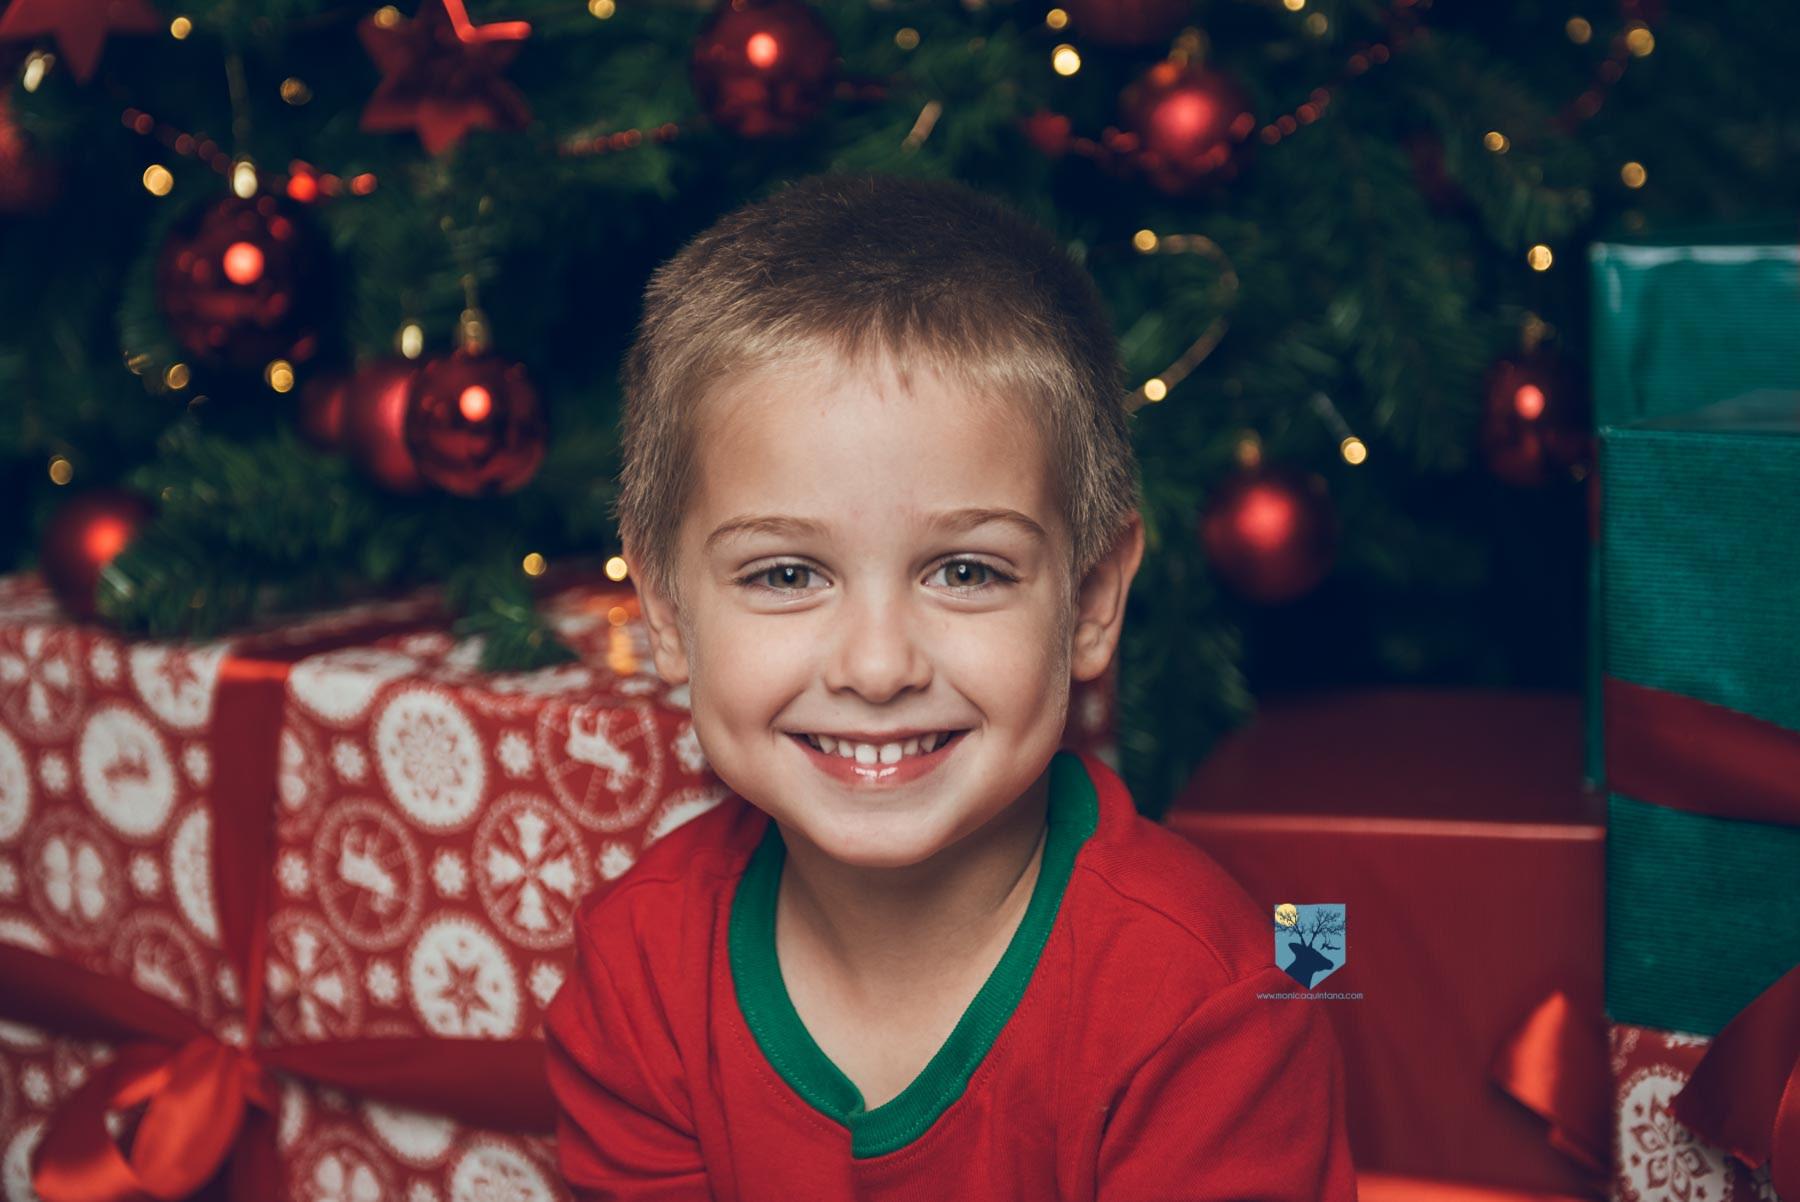 fotografia, fotos, girona, figueres, emporda, monica quintana, niños, niña, retrato. estudio, navidad, nadal